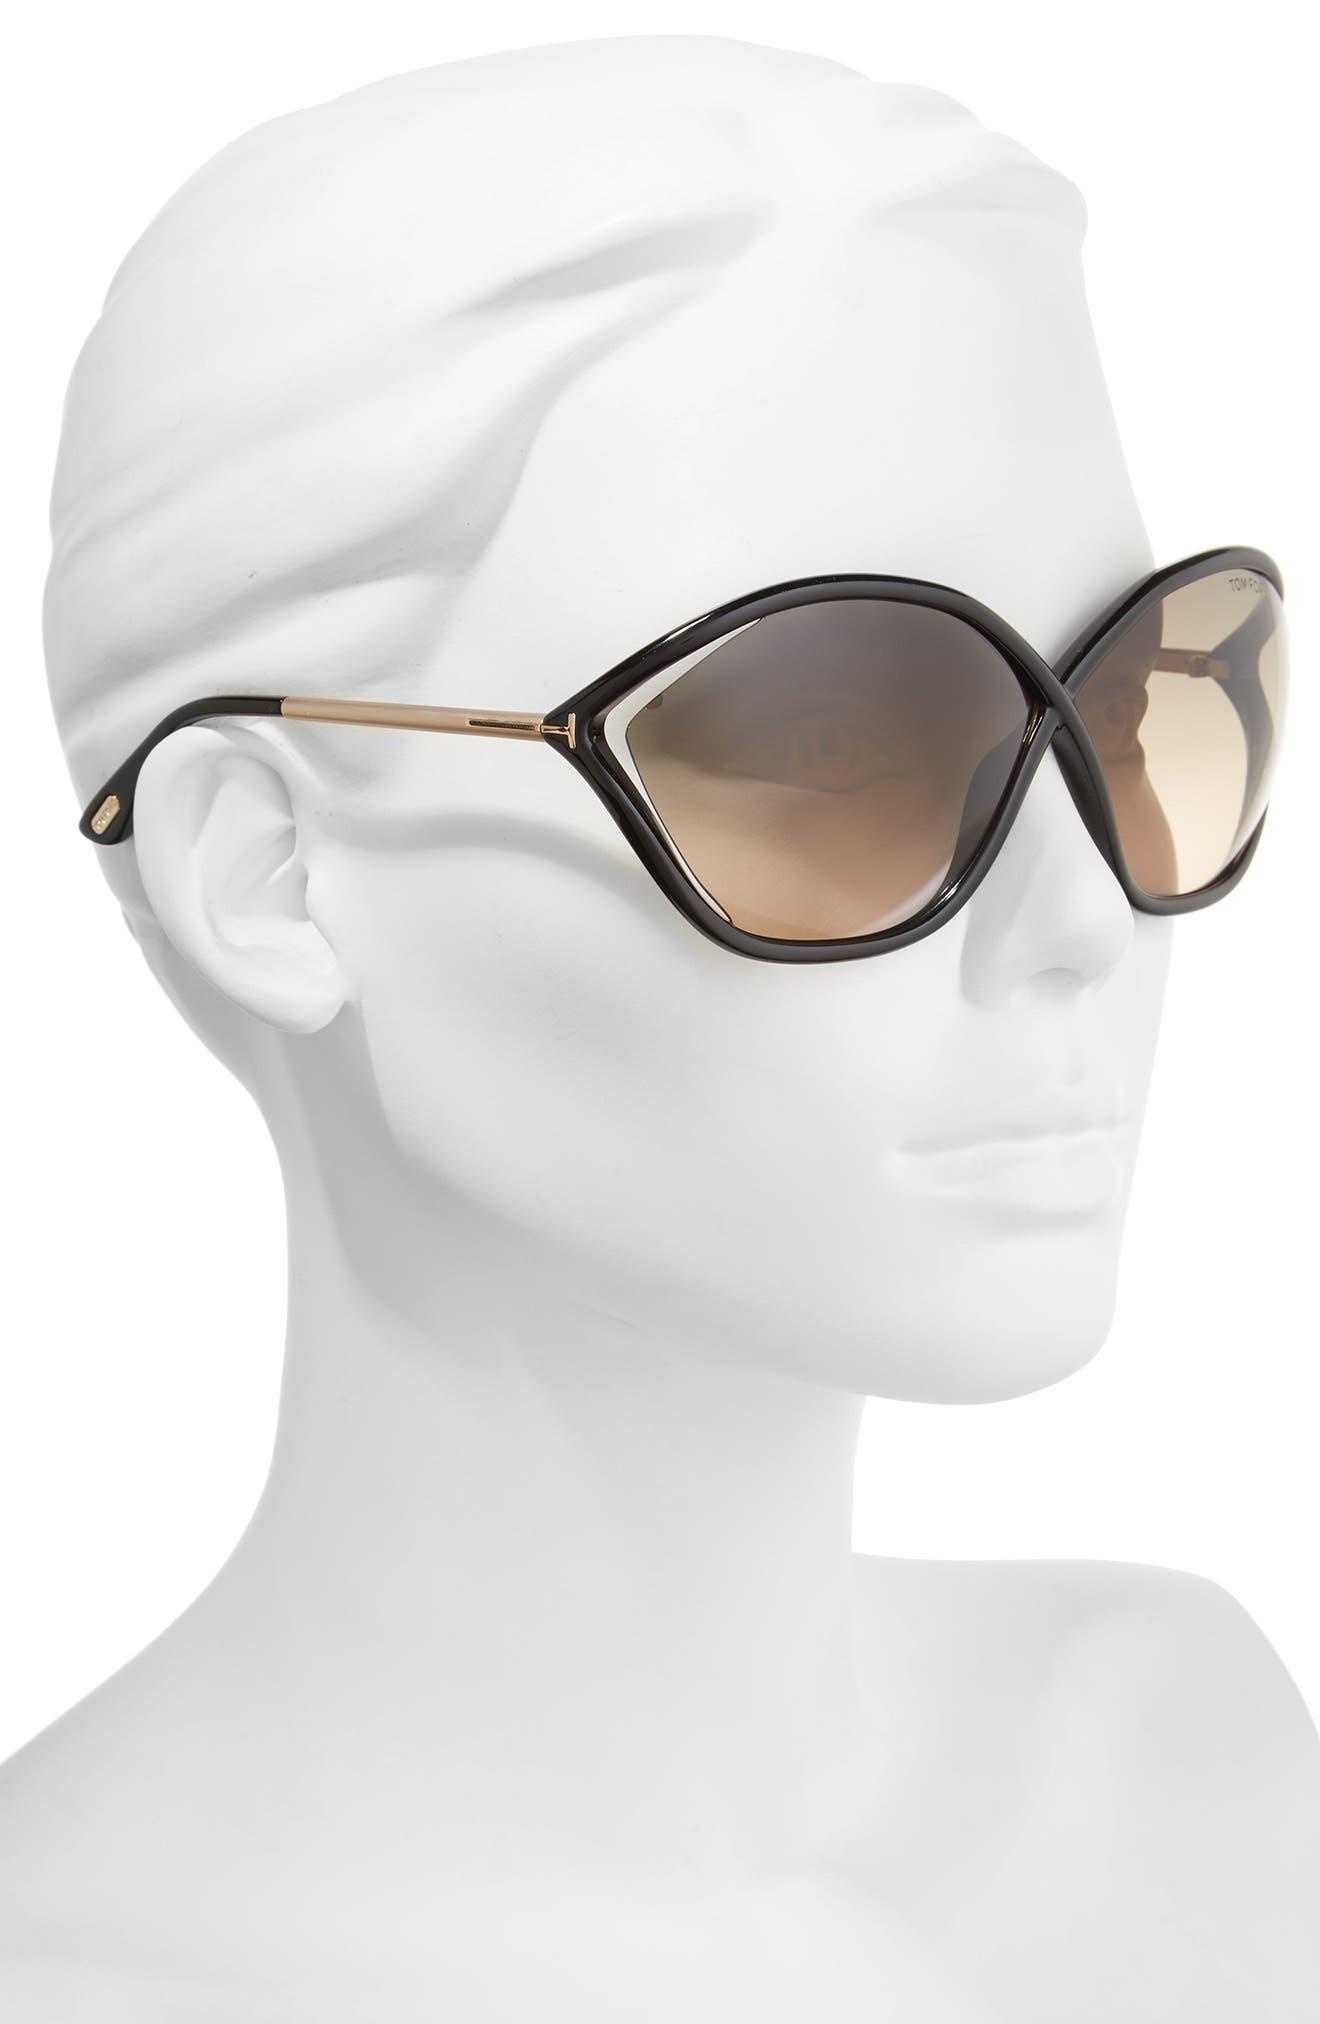 Bella 71mm Gradient Lens Sunglasses,                             Alternate thumbnail 2, color,                             001